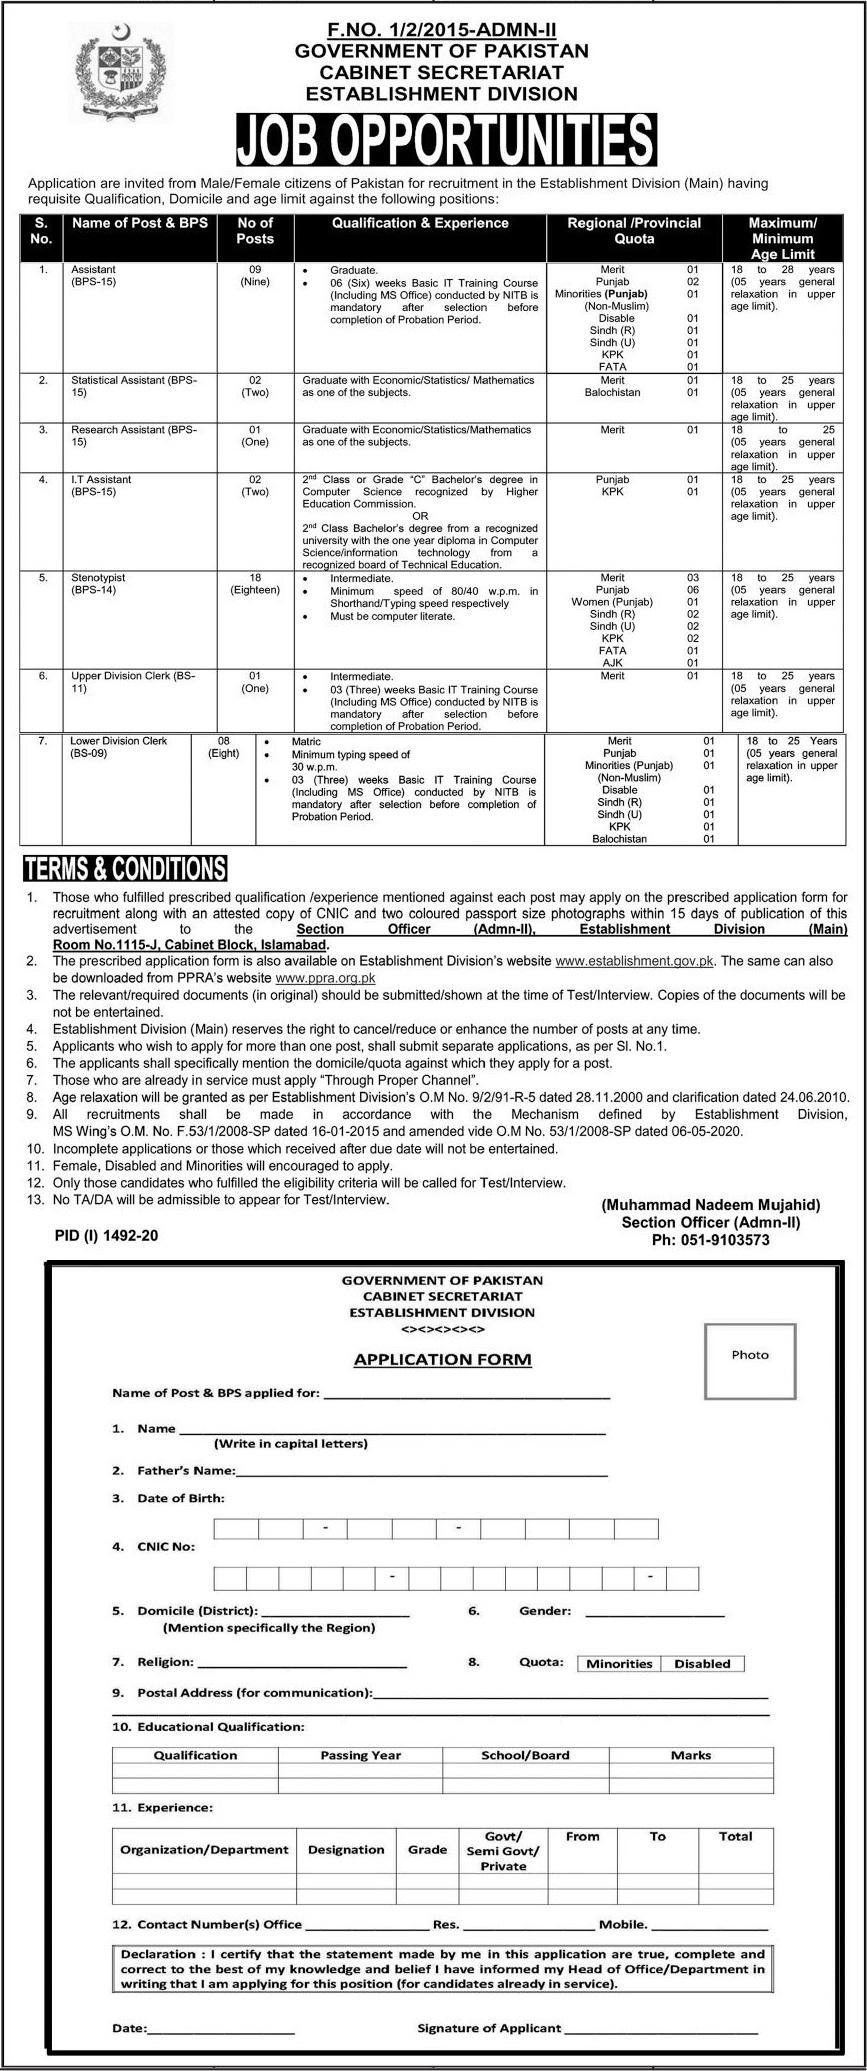 Cabinet Secretariat Jobs 2020 For Islamabad